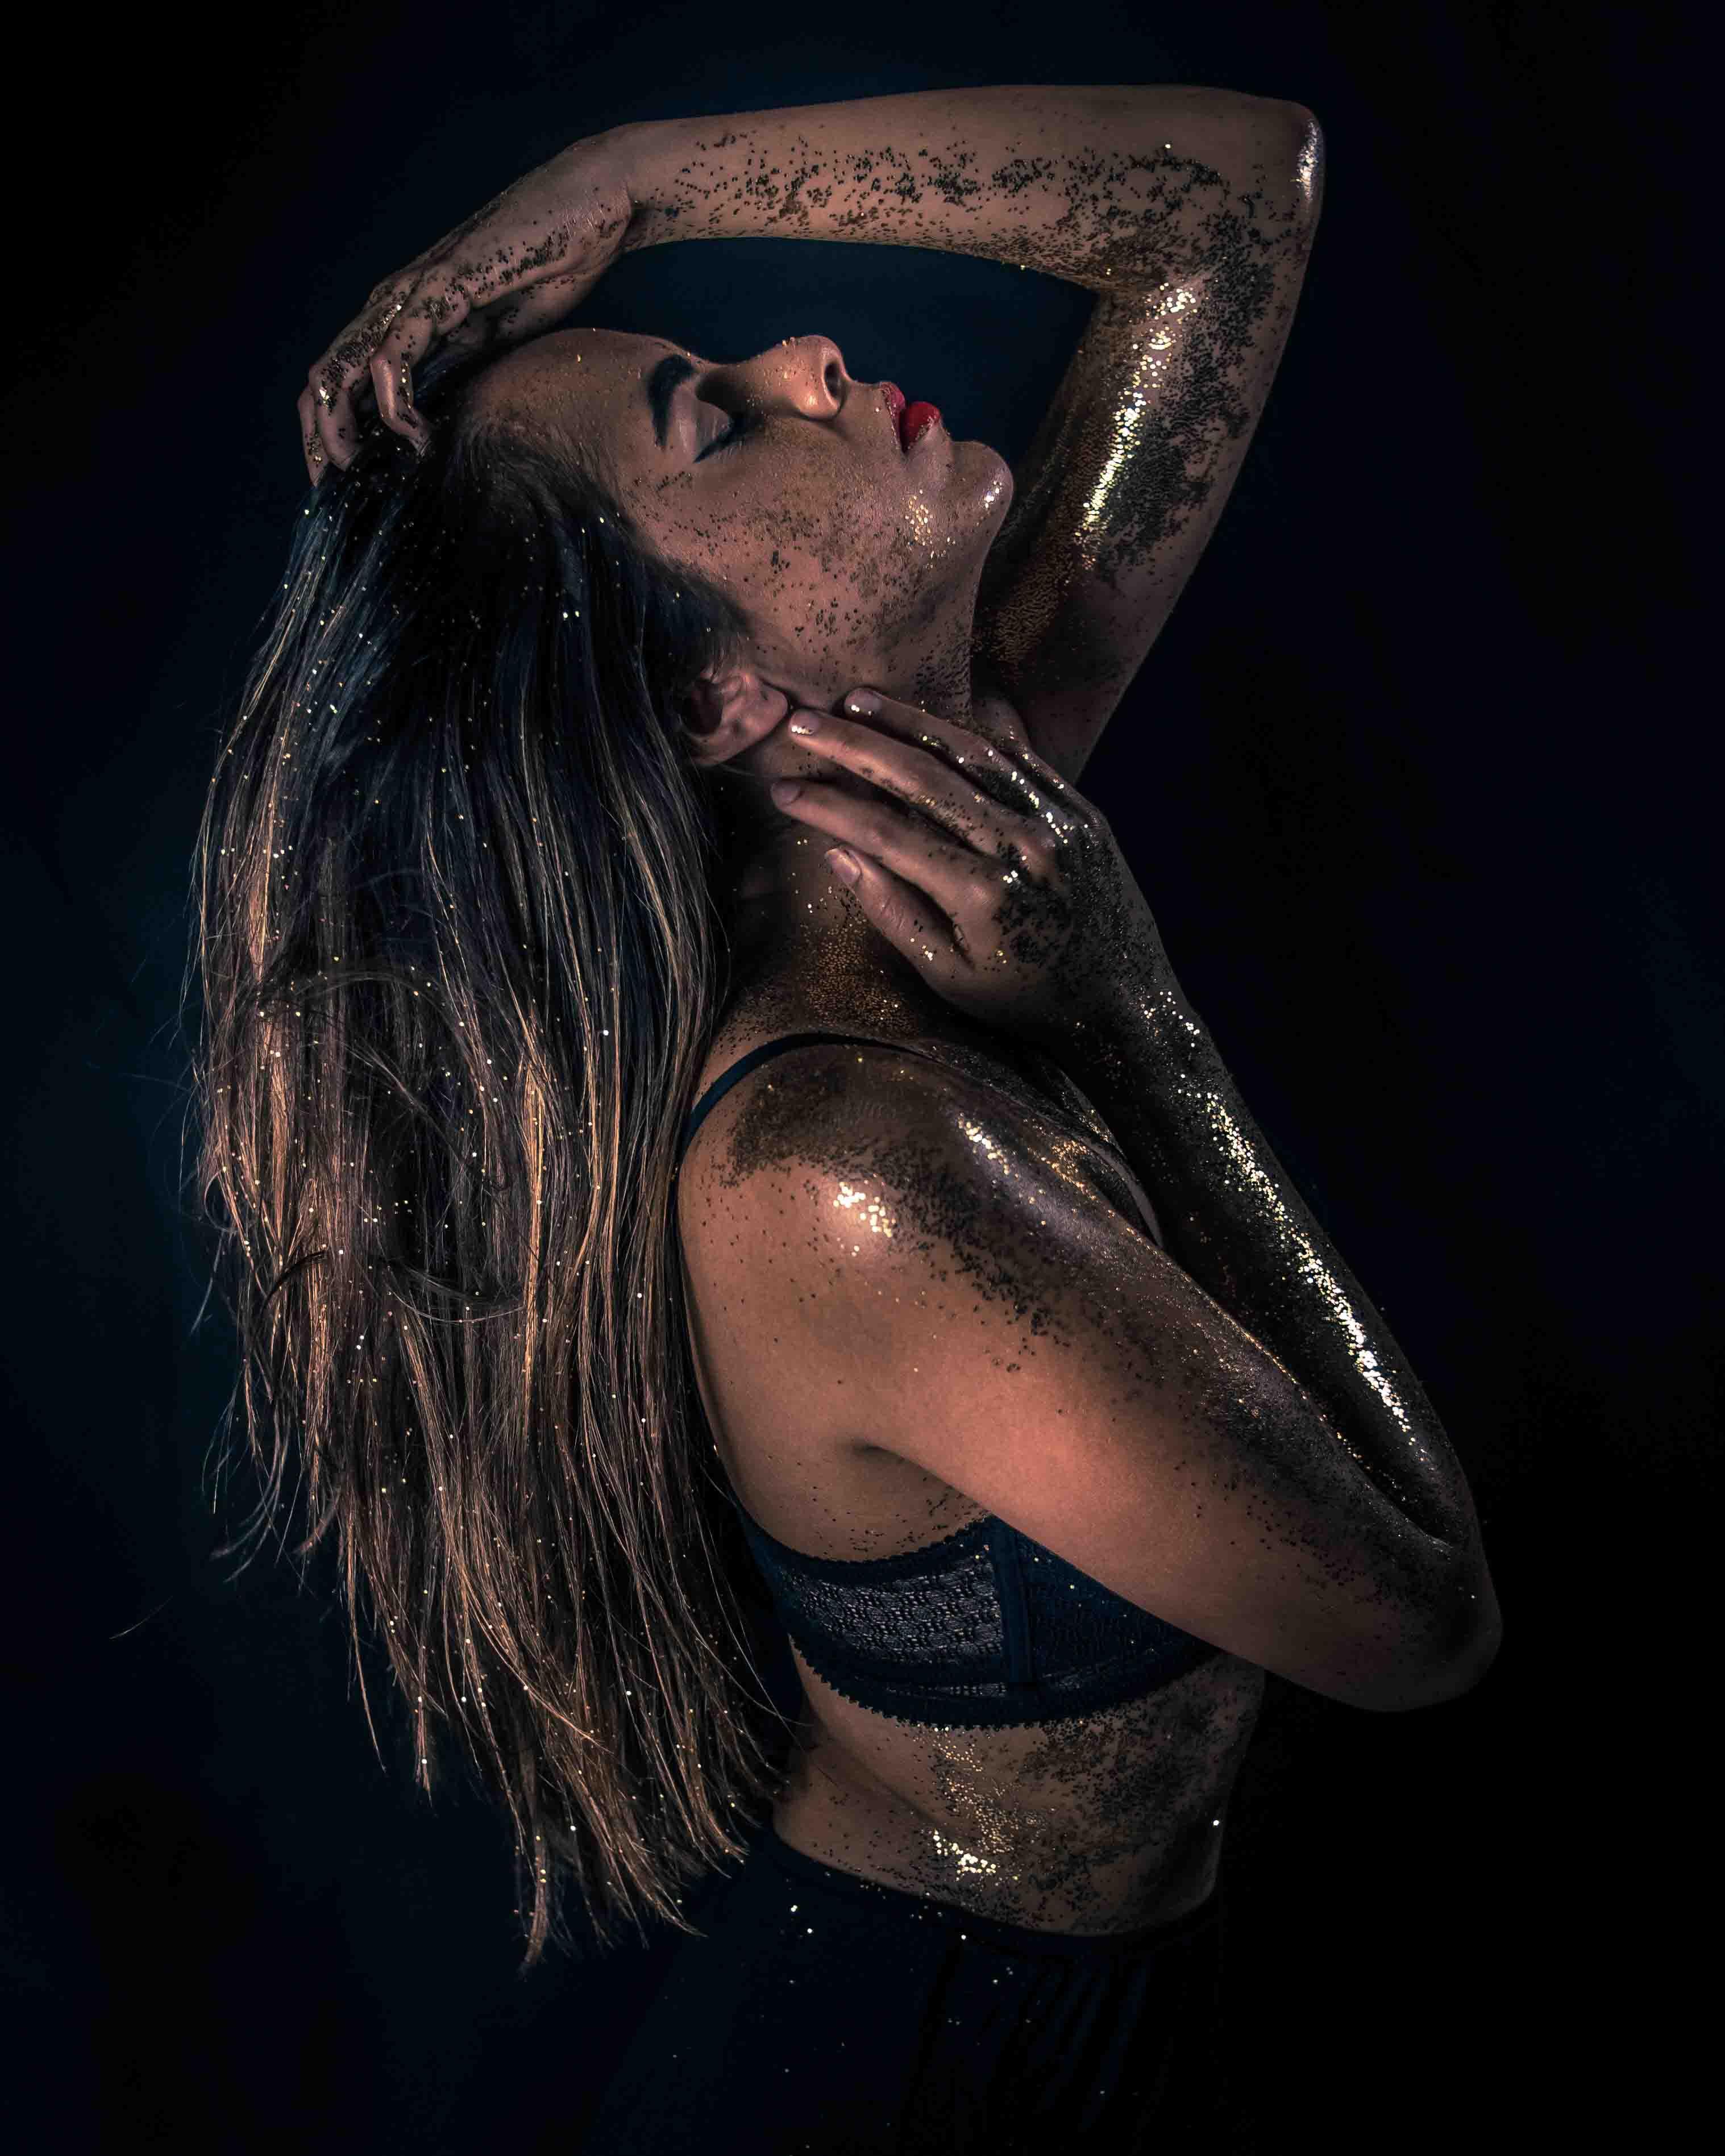 Black escorts - sexy lady